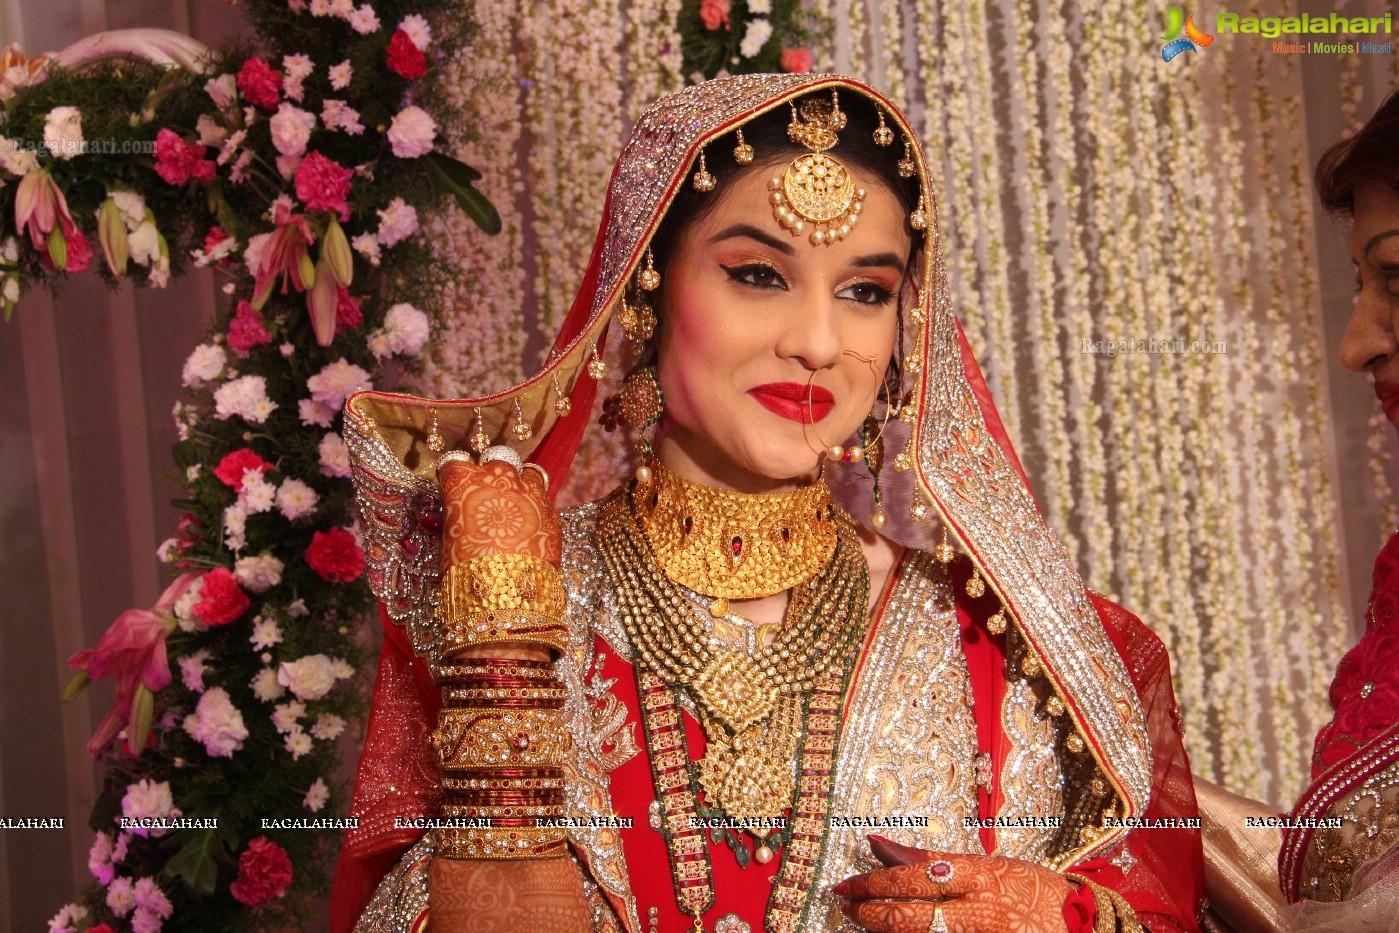 Mehndi Ceremony Zara : Mehndi ceremony california and international wedding planner